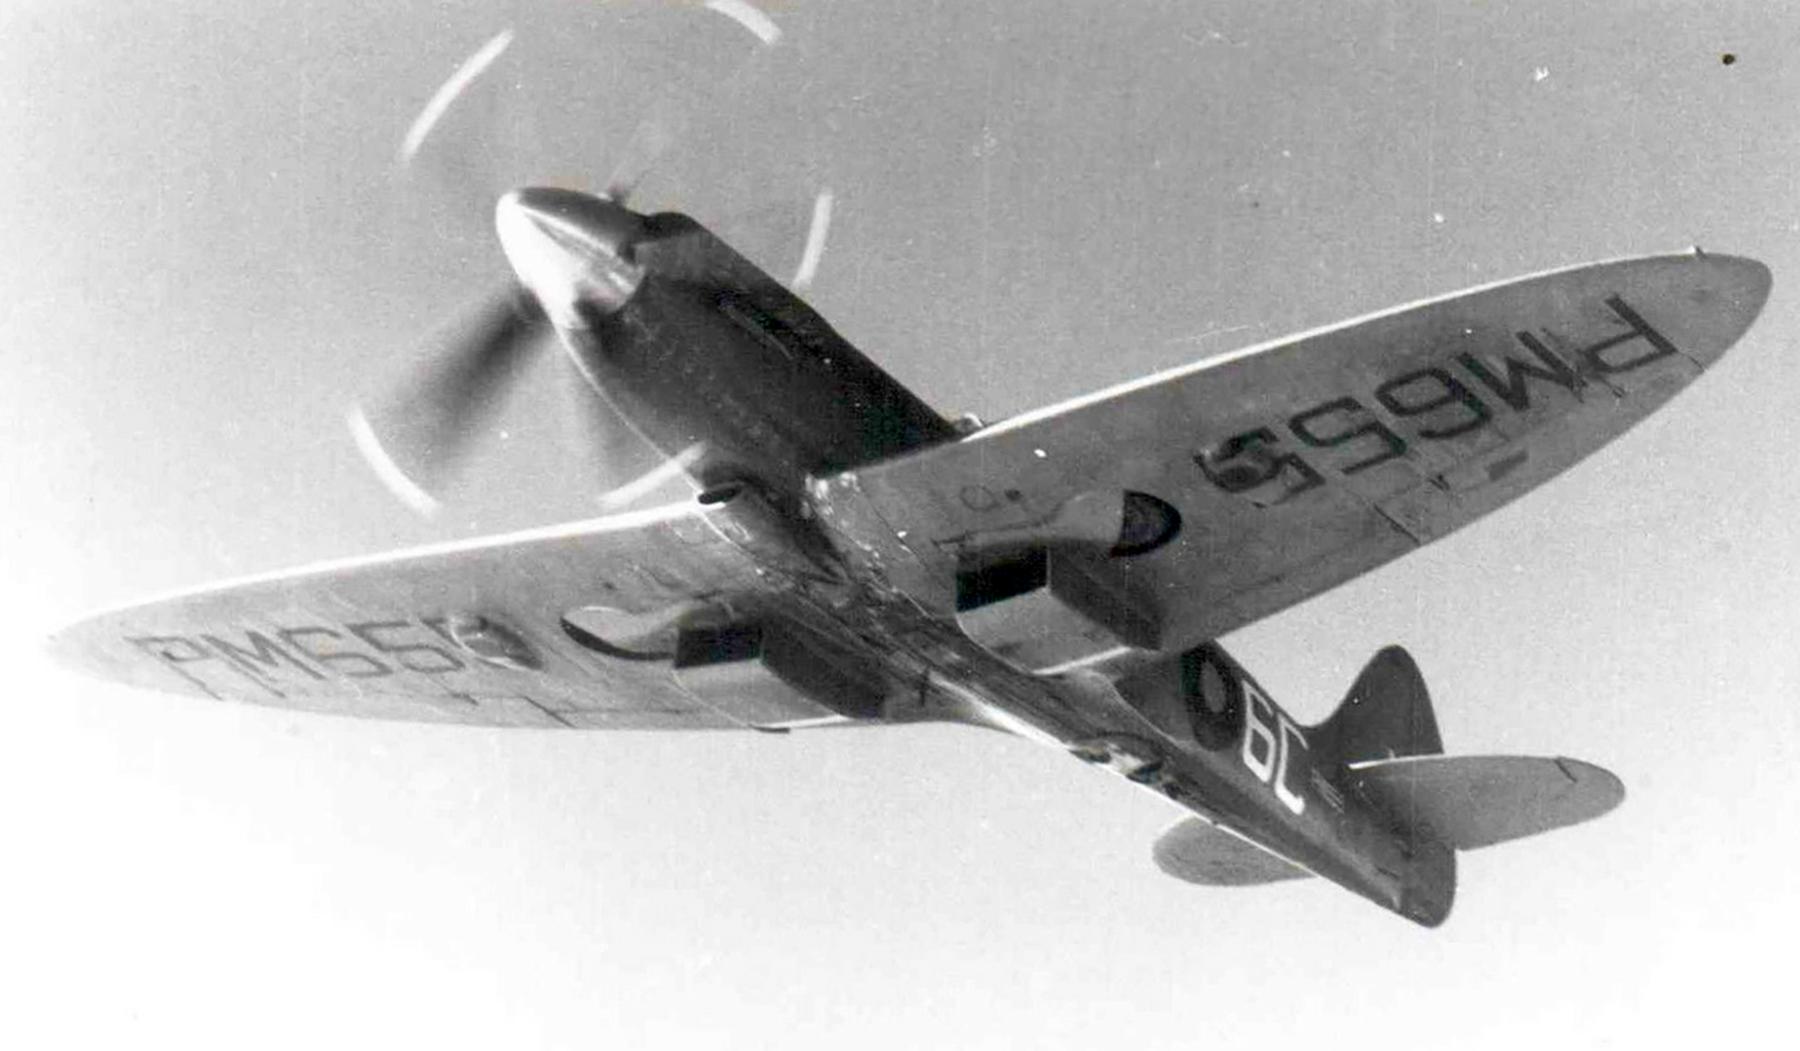 Spitfire PR19 Prototype RAF 541Sqn 6C PM655 Benson 1950 ebay 01